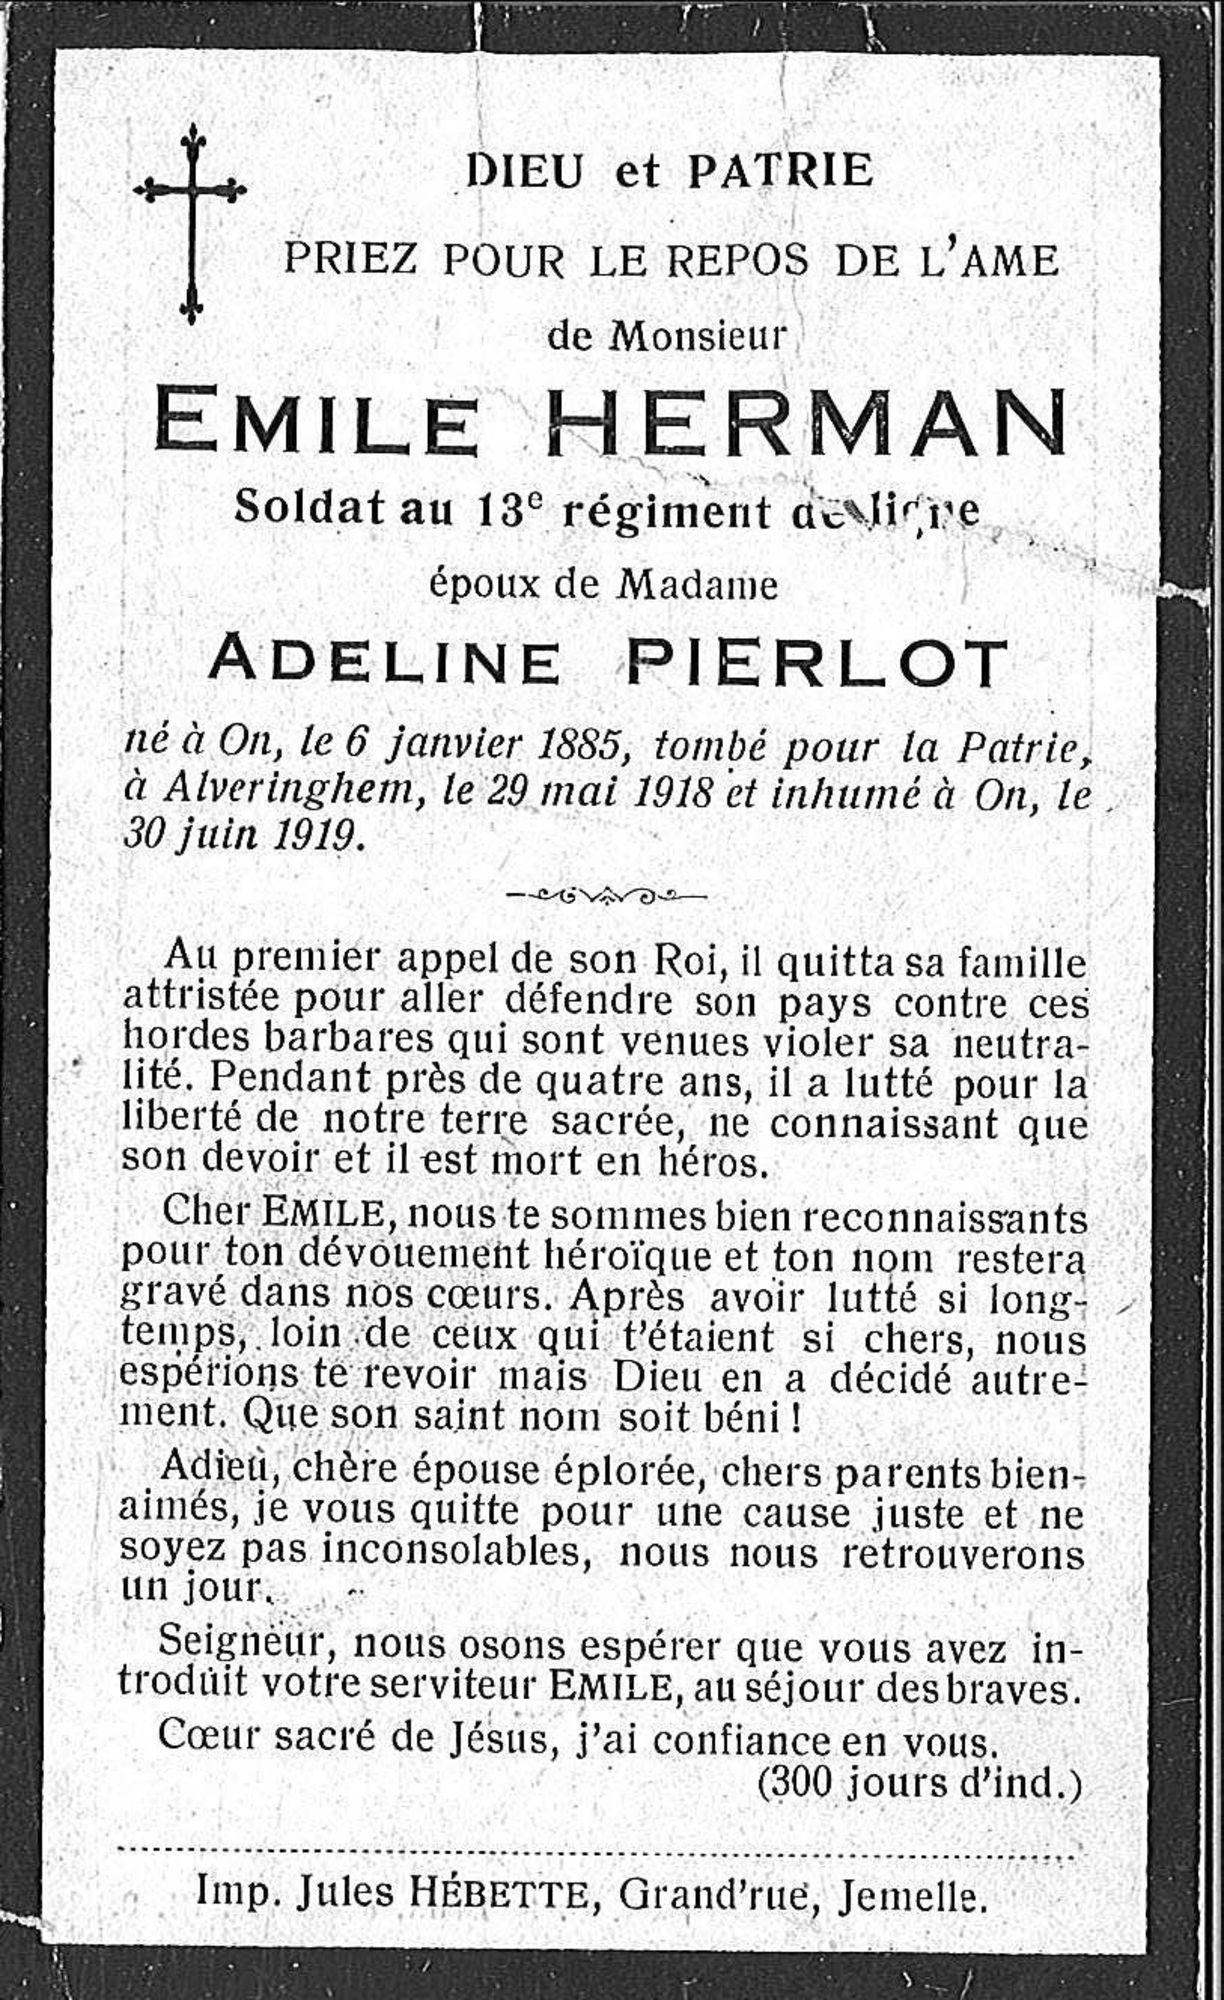 Emile Herman